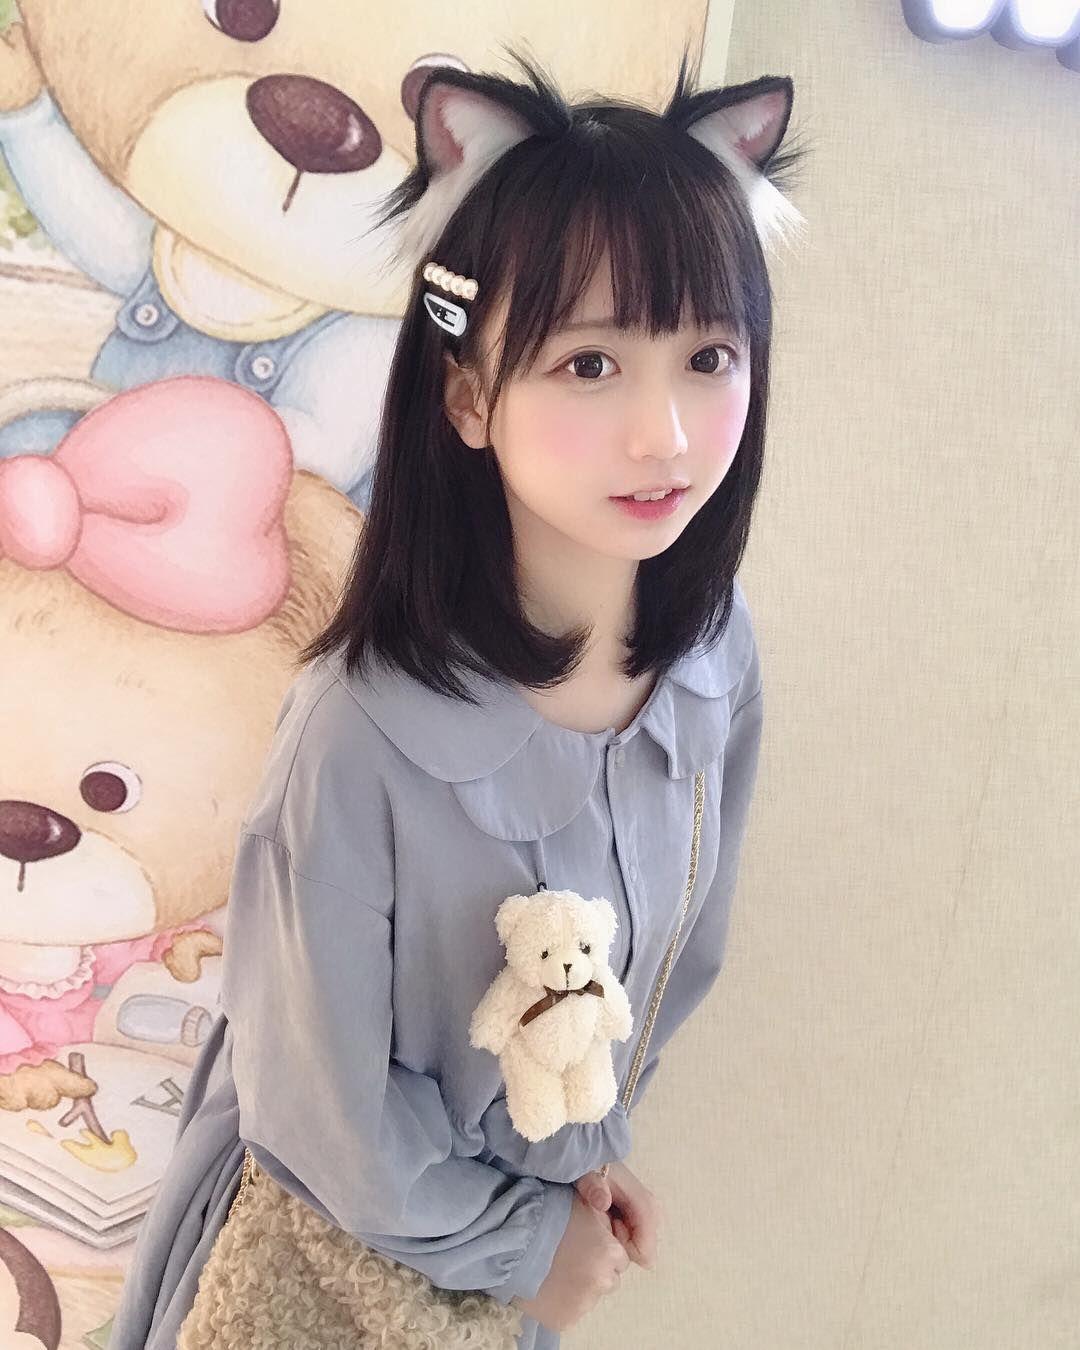 Gambar mungkin berisi 1 orang ねこ, かわいい, 可愛い女の子